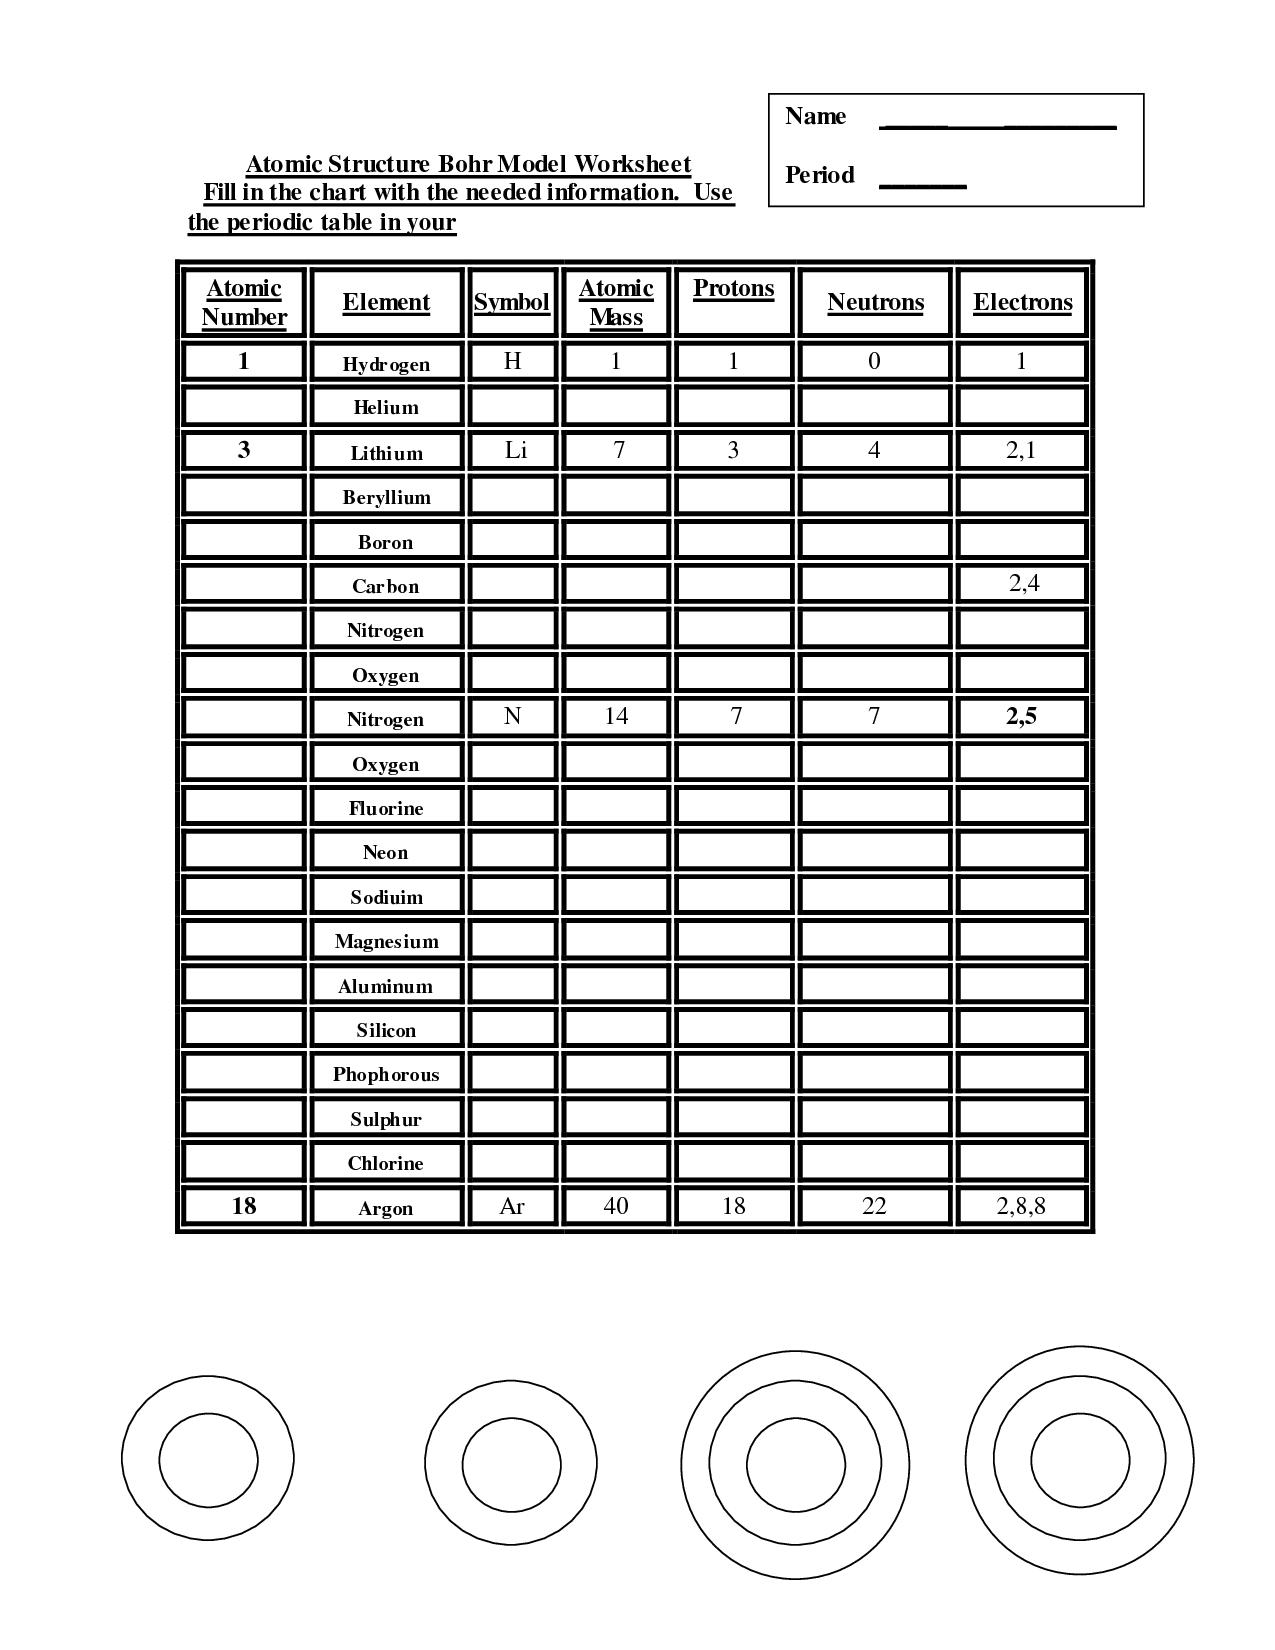 Bohr Model Atomic Structure Worksheet Answer Sheet